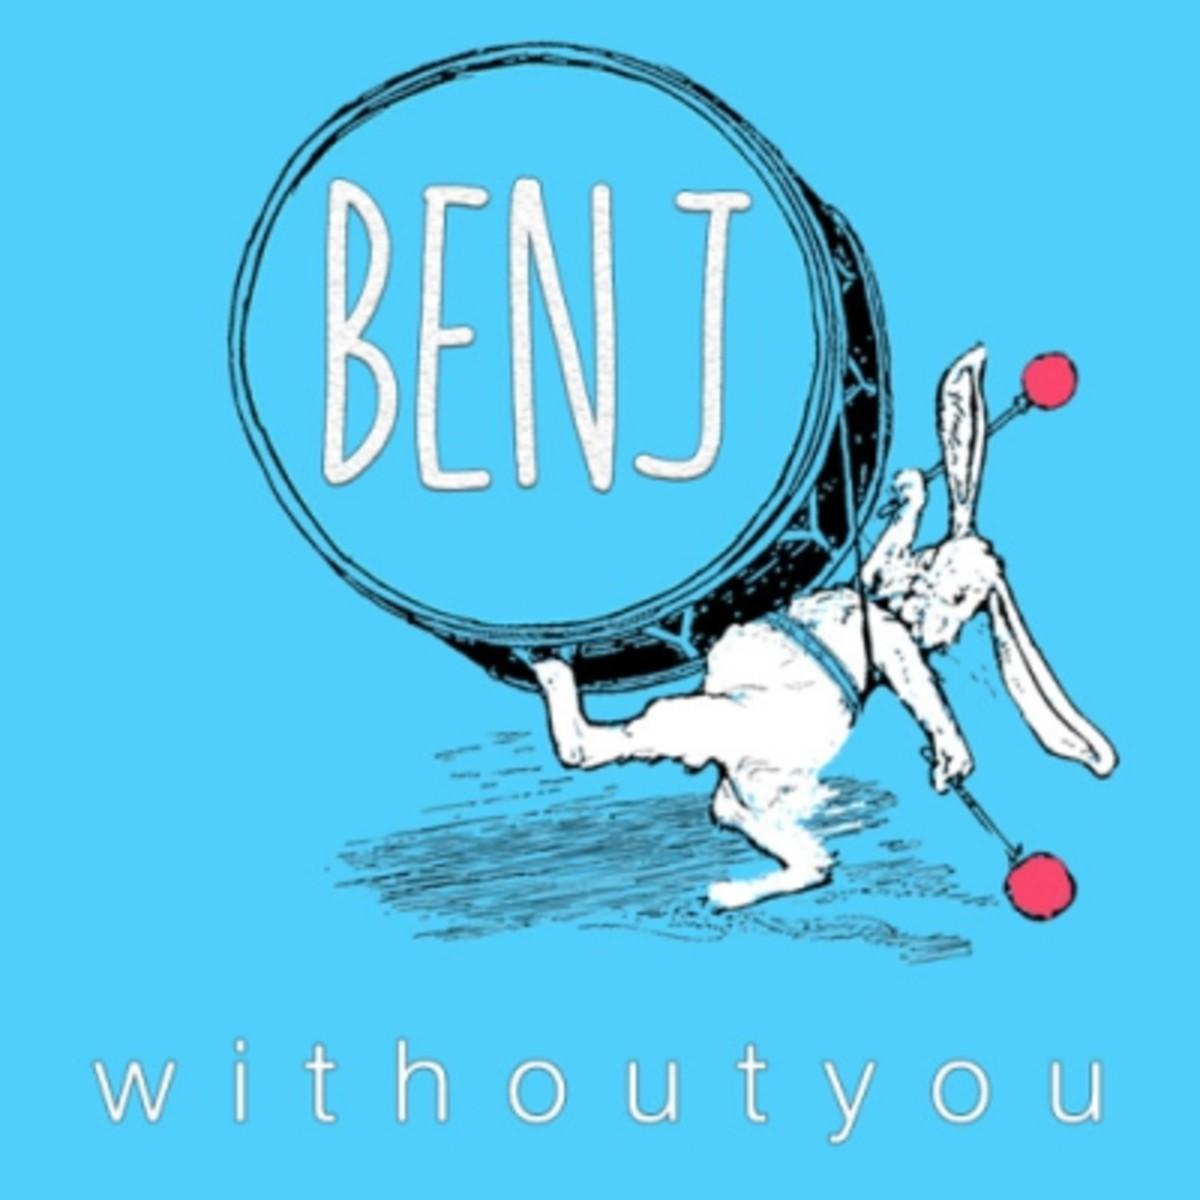 benj-without-you.jpg